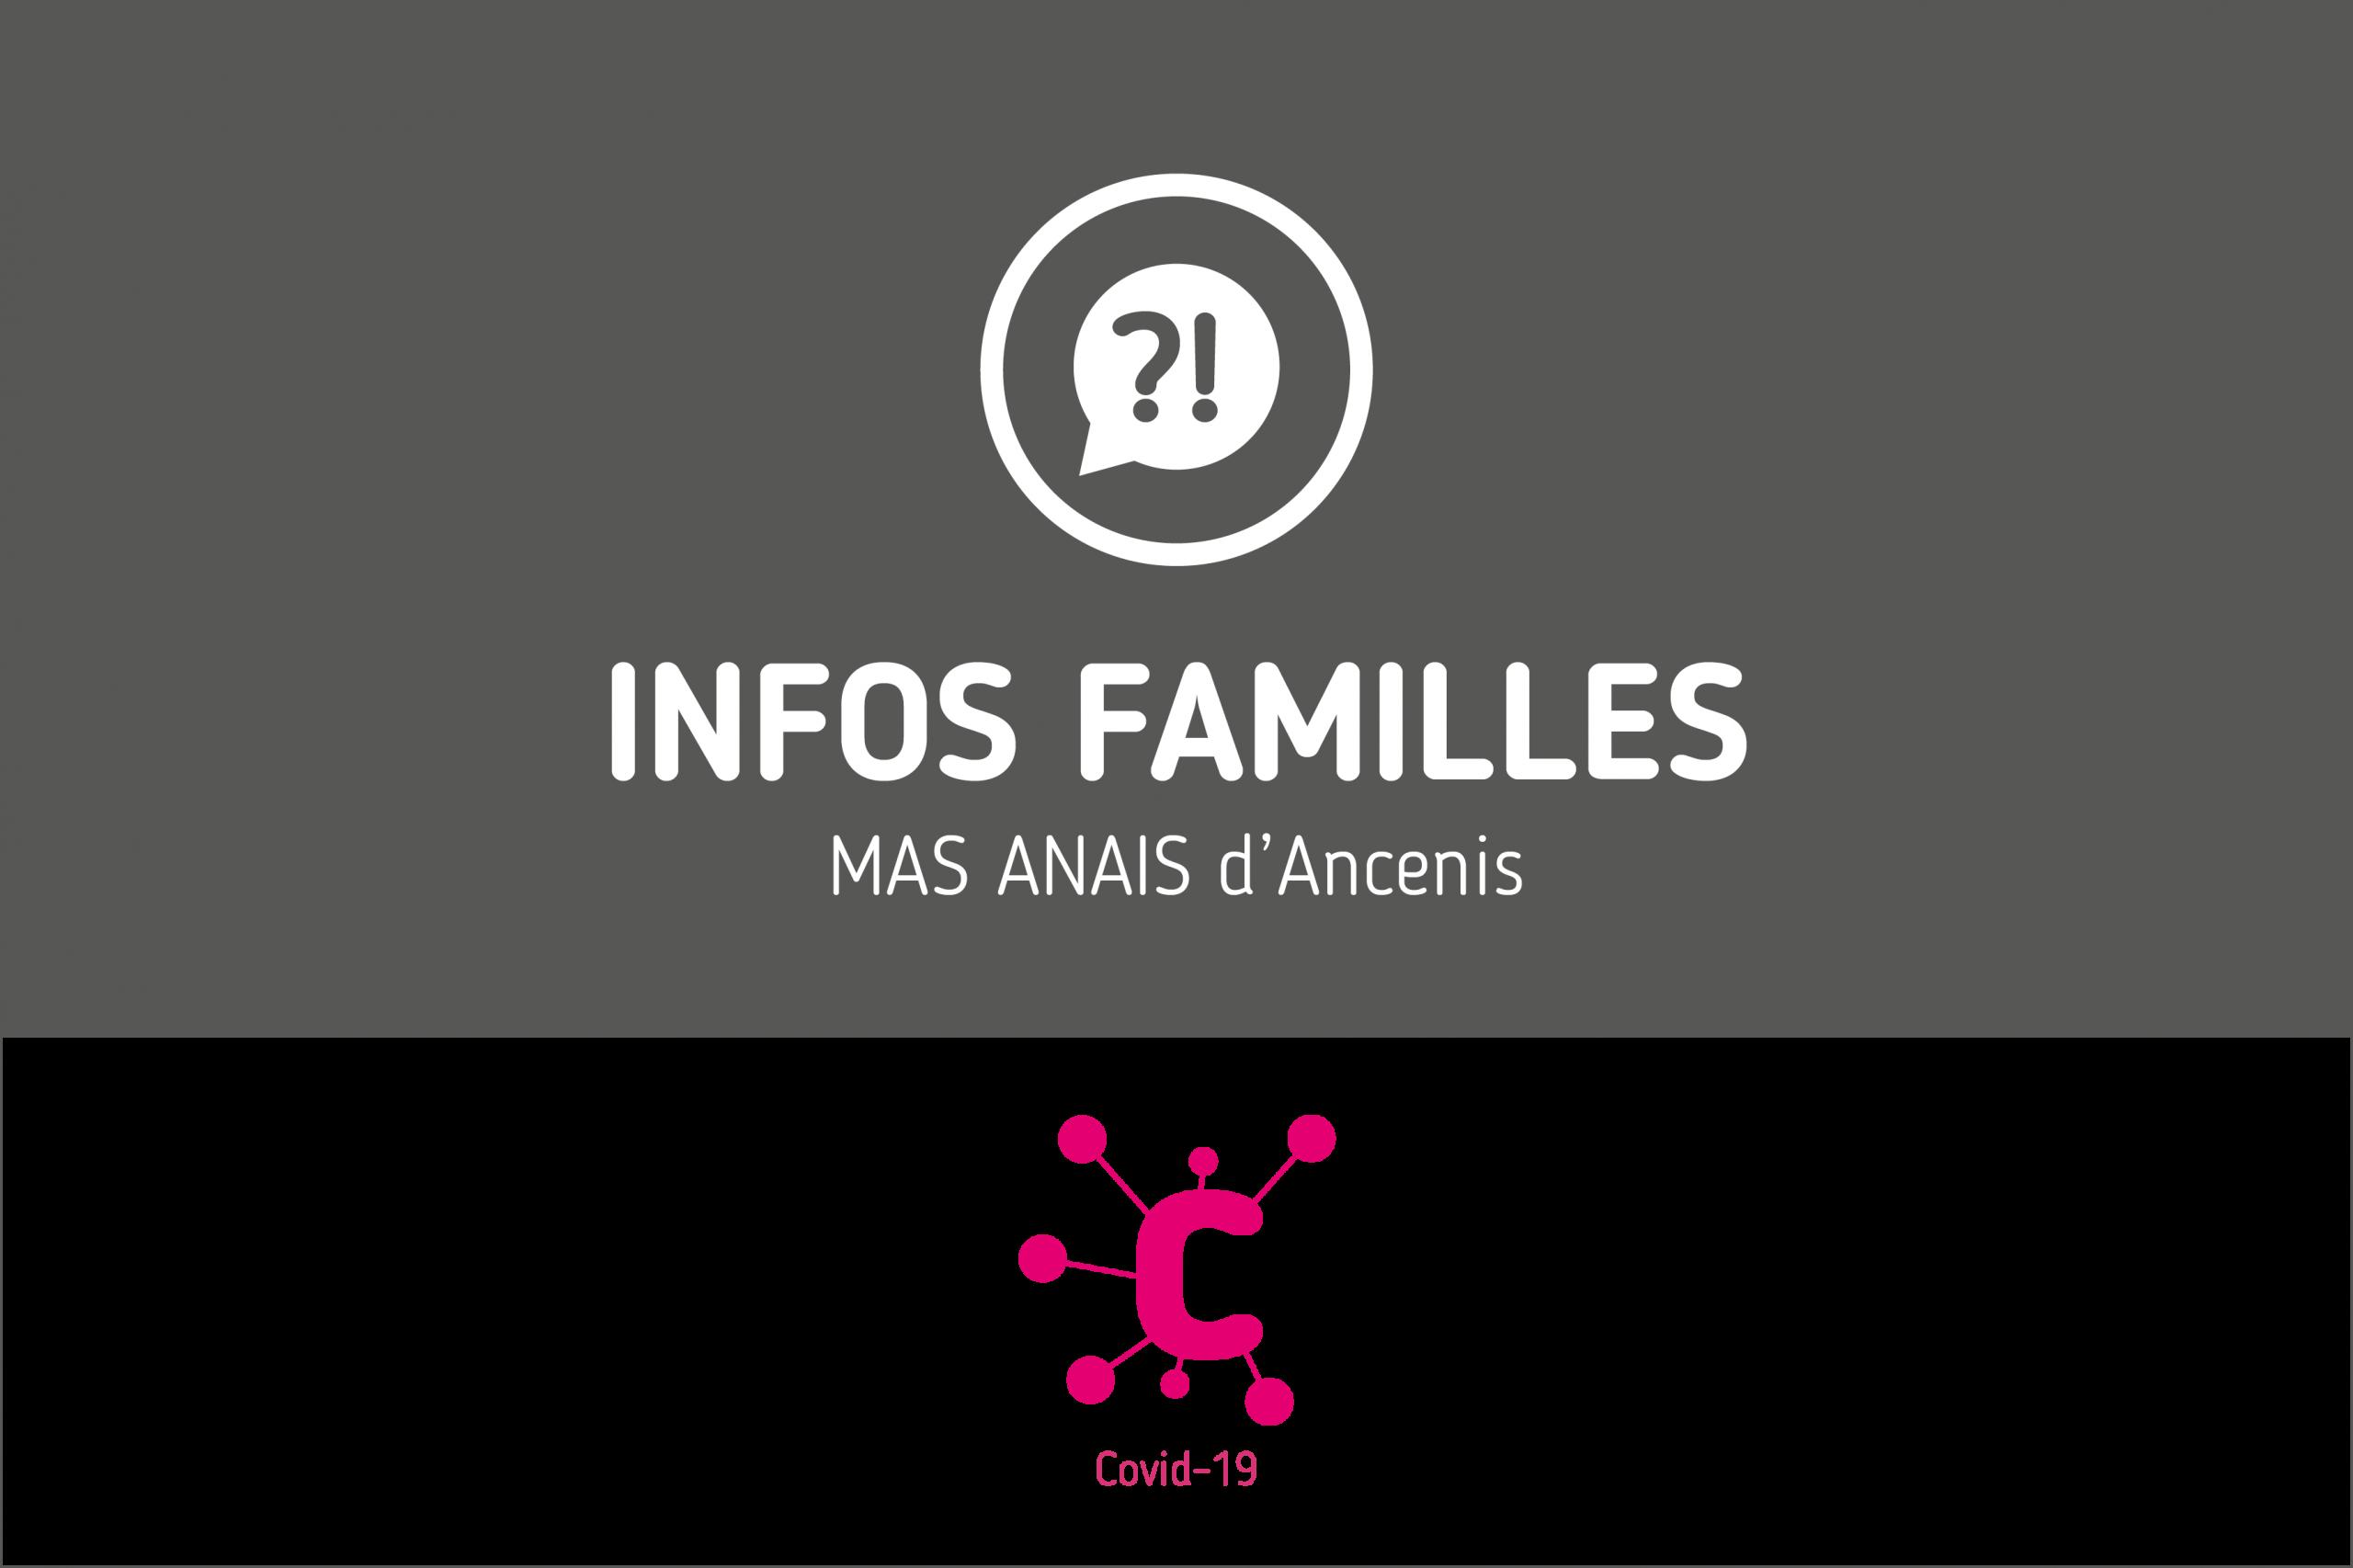 Protégé: Infos Familles – MAS ANAIS d'Ancenis